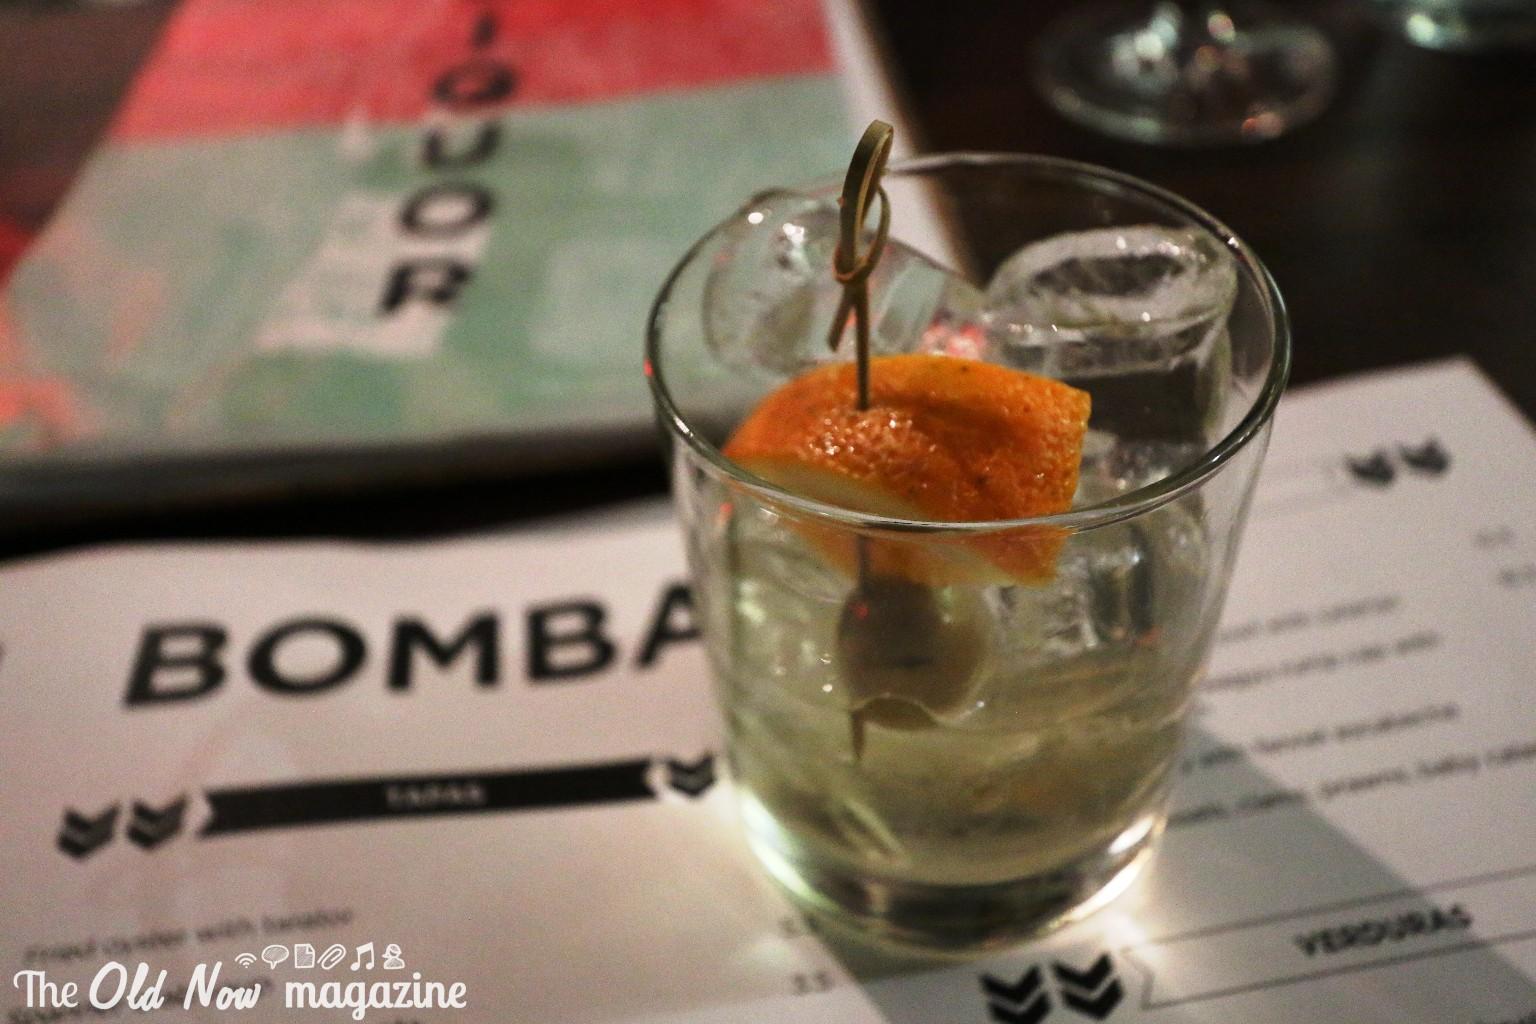 BOMBA TAPAS BAR AND ROOFTOP THEOLDNOW (6)